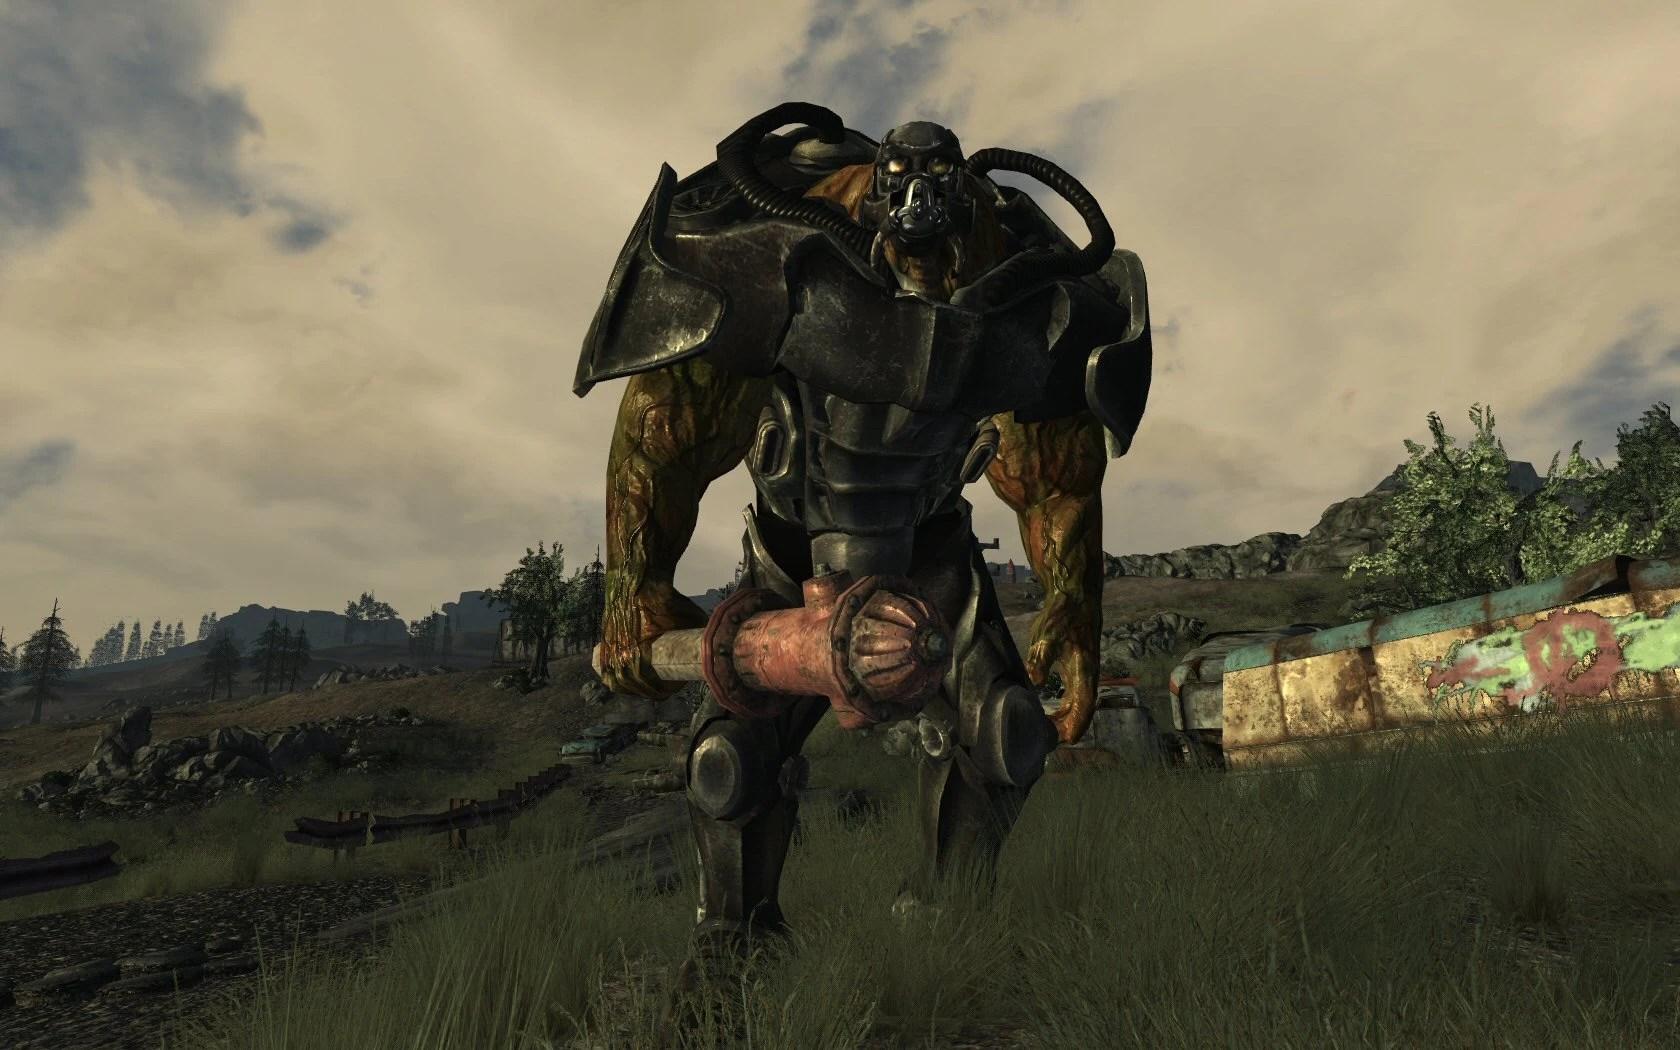 Power Armor Fallout 3 Wallpaper Hd